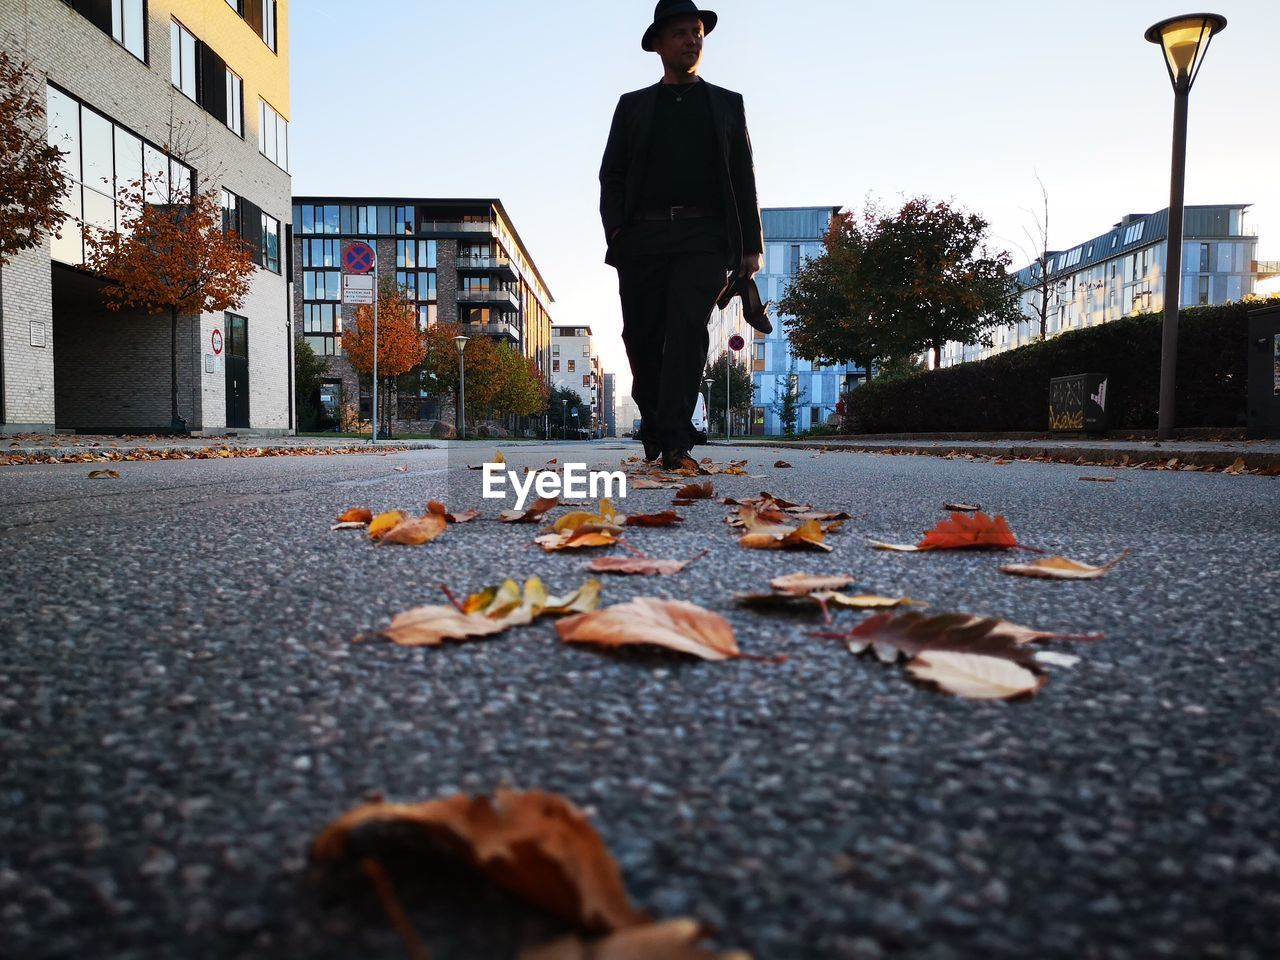 Man walking on leaves in city